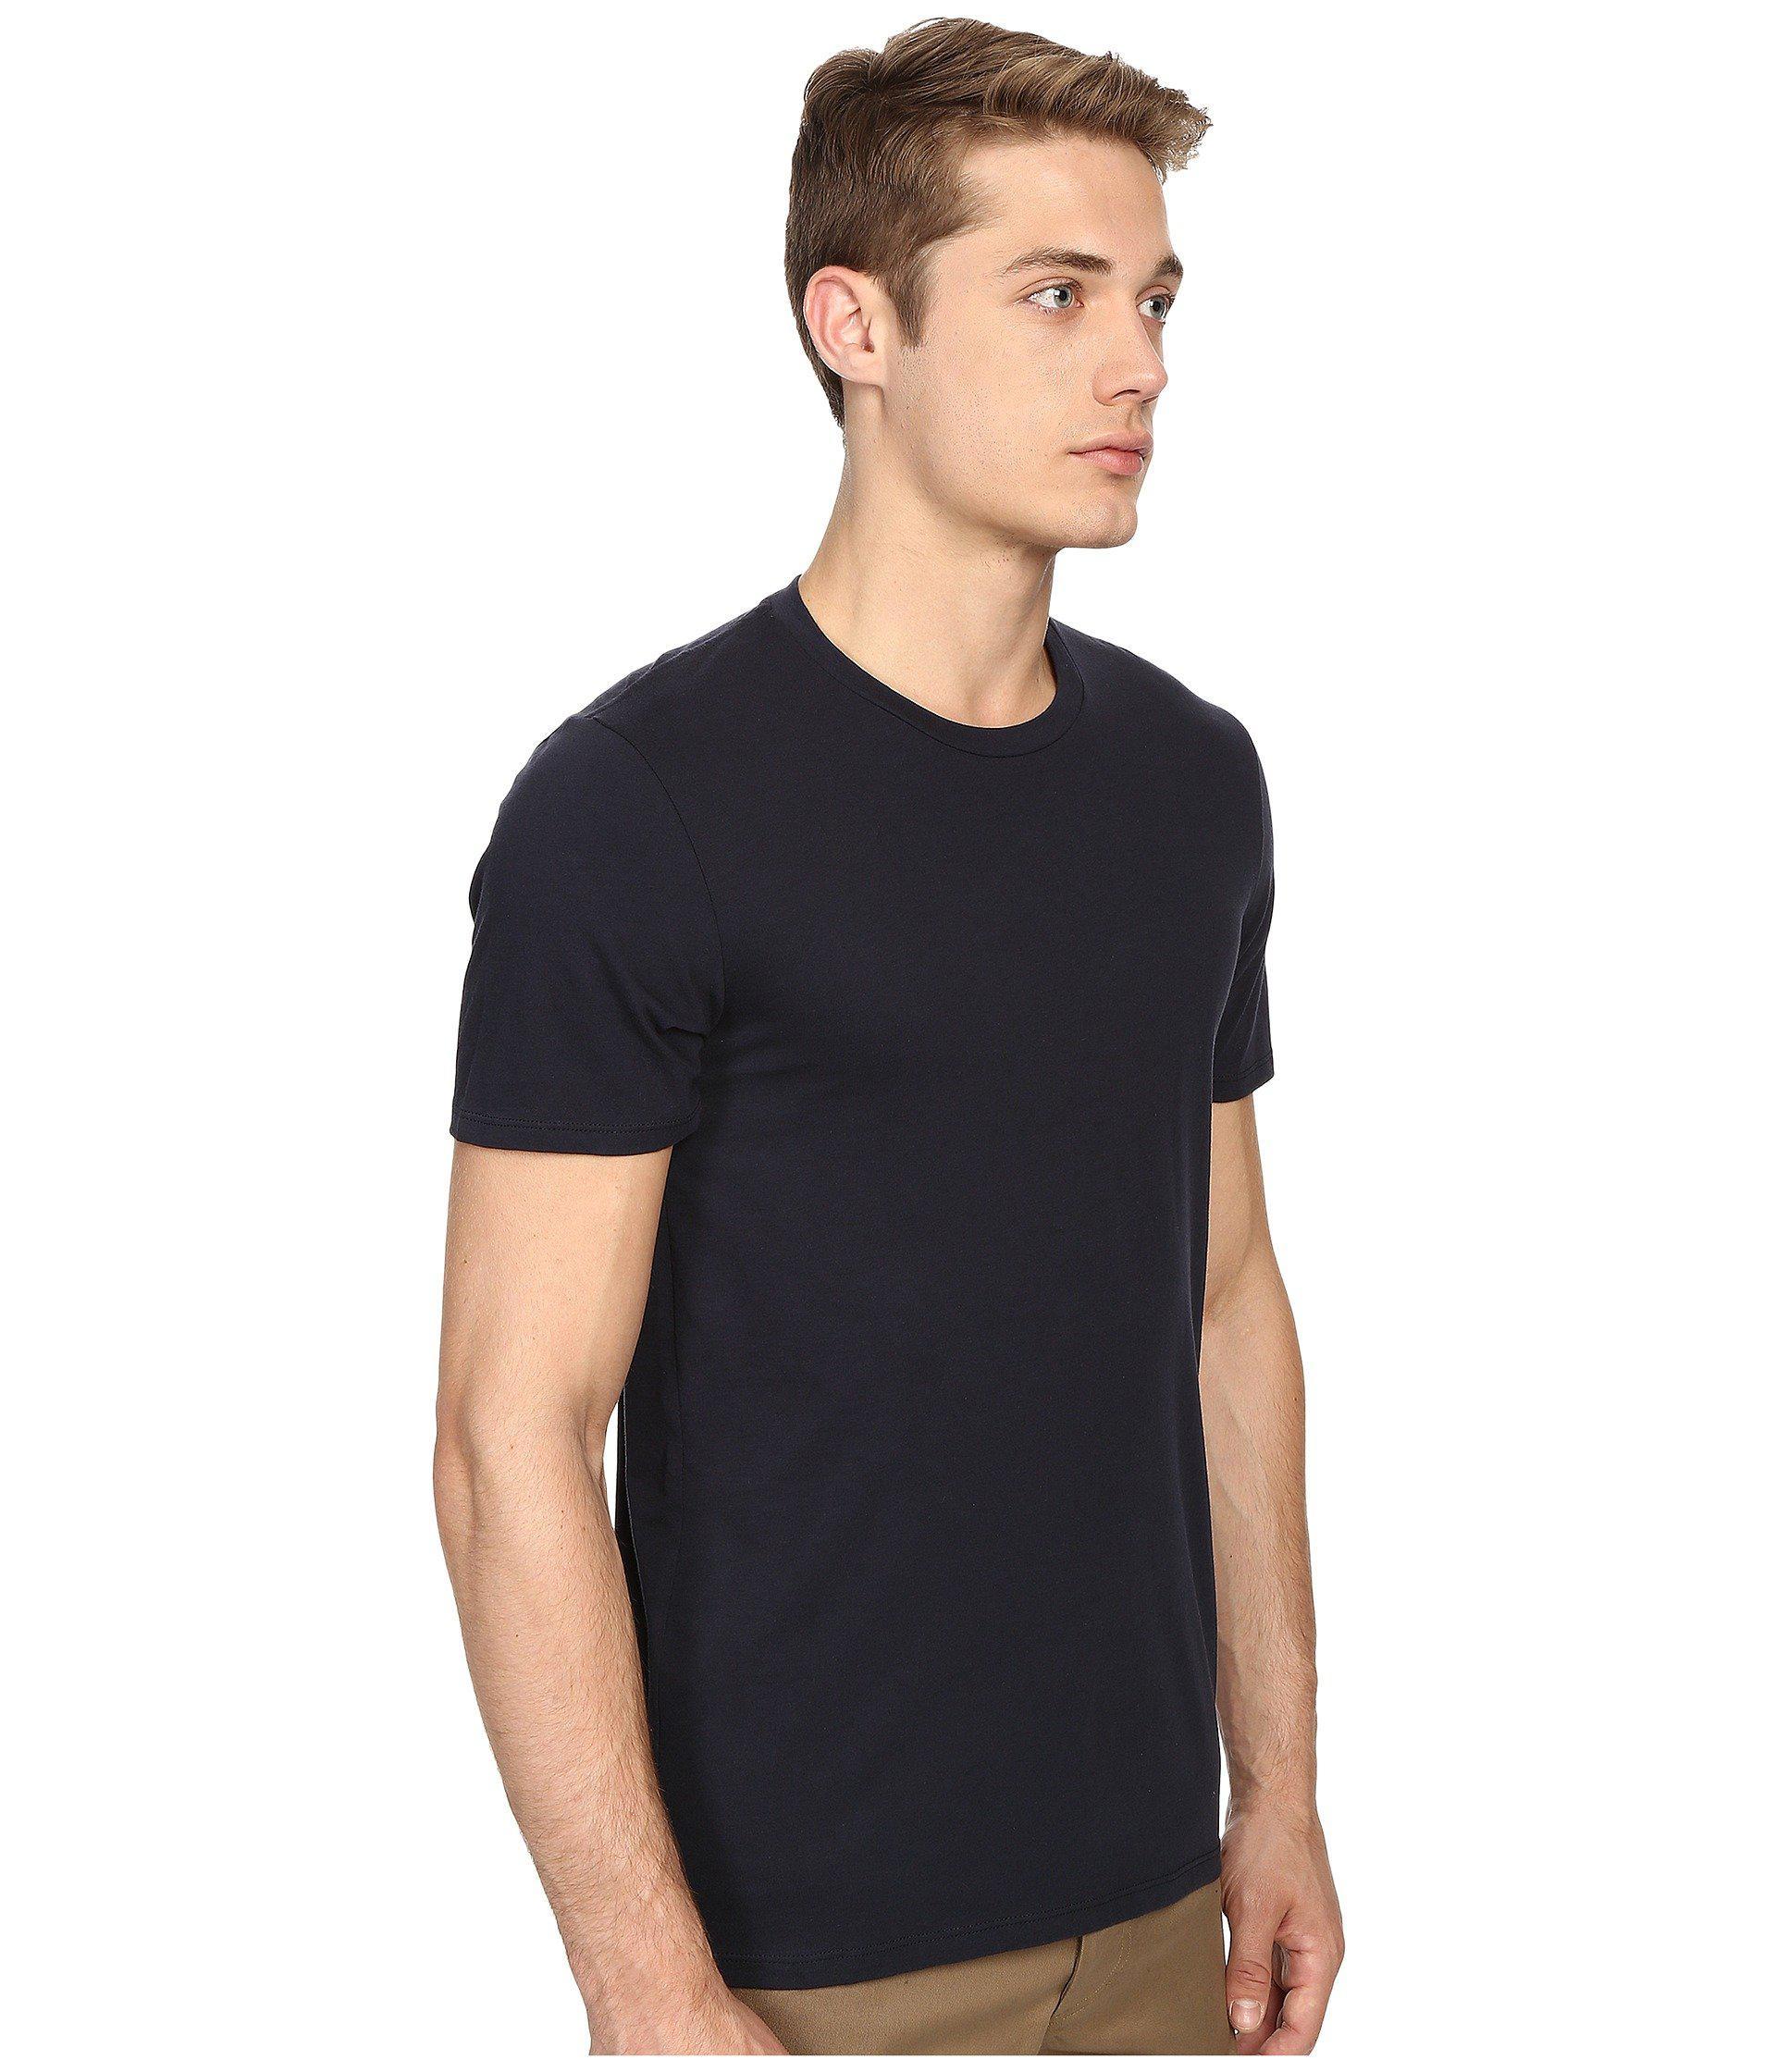 Vince Short Sleeve Pima Cotton Crew Neck Shirt Black Men